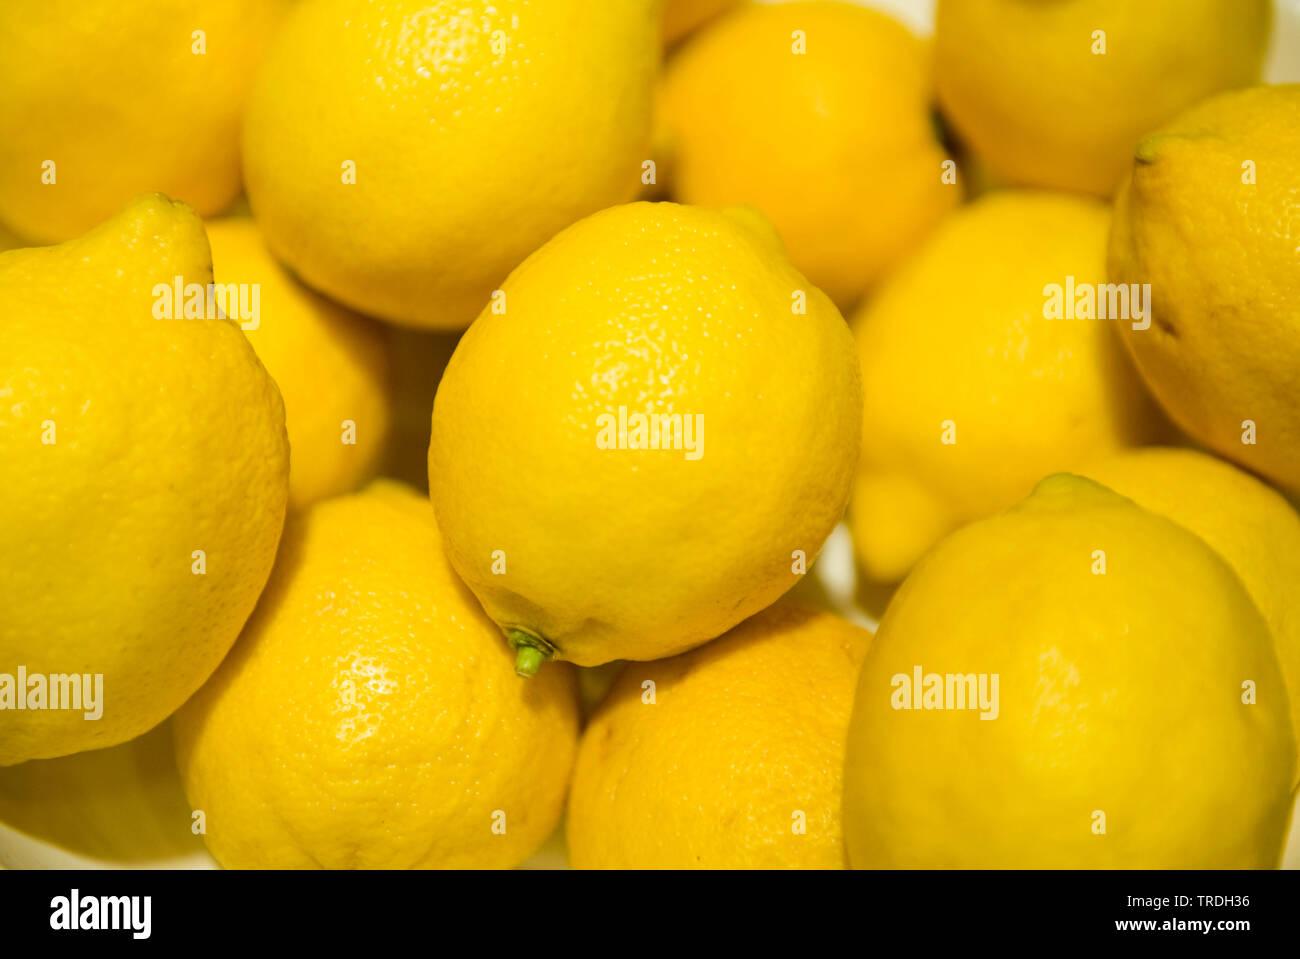 Zitrone (Citrus limon), viele reife Zitronen | Zitrone (Citrus limon), viele reife Zitronen | BLWS 503756.jpg [(c) Blickwinkel/McPHOTO/M. Begsteiger Tel. +4 Stockbild